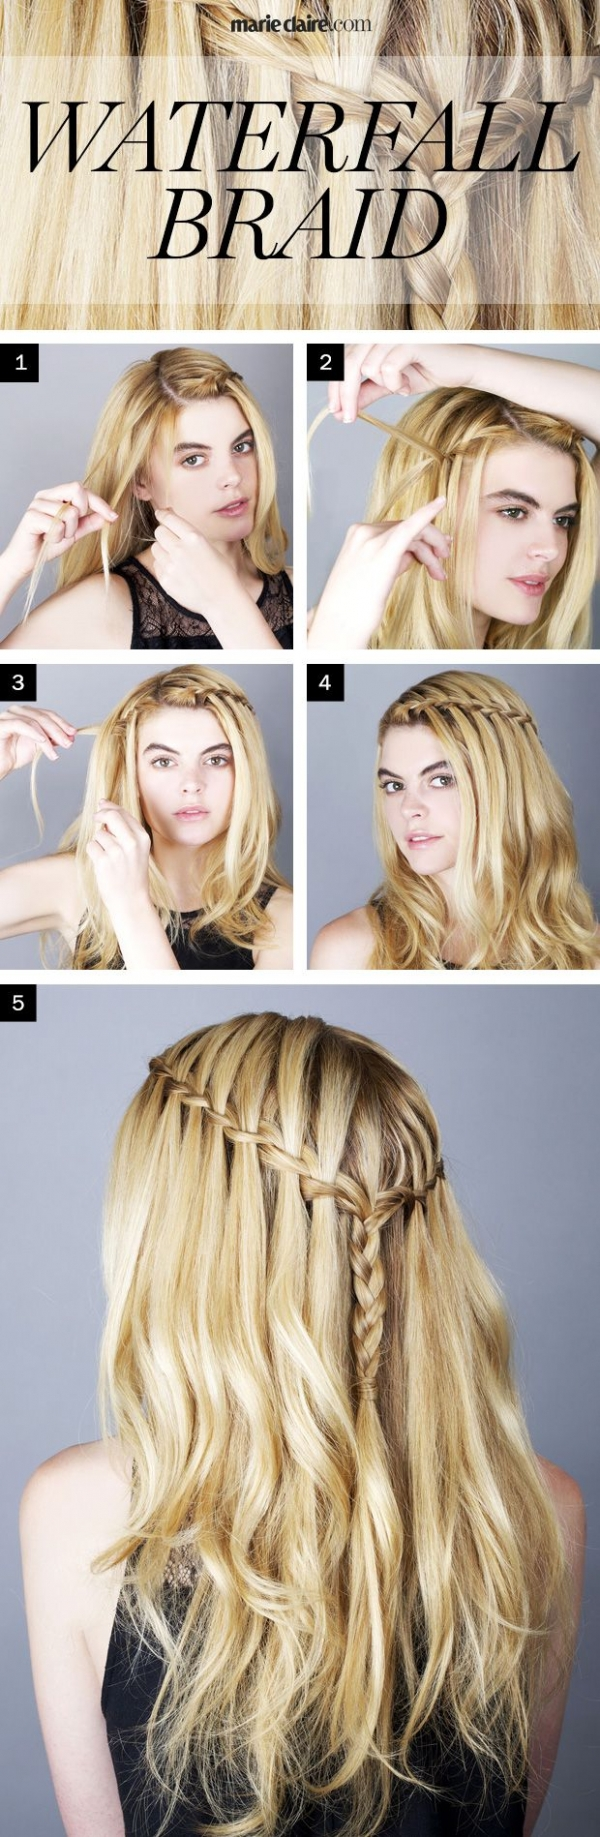 11. Waterfall Braid - Fuel Your Braid Obsession